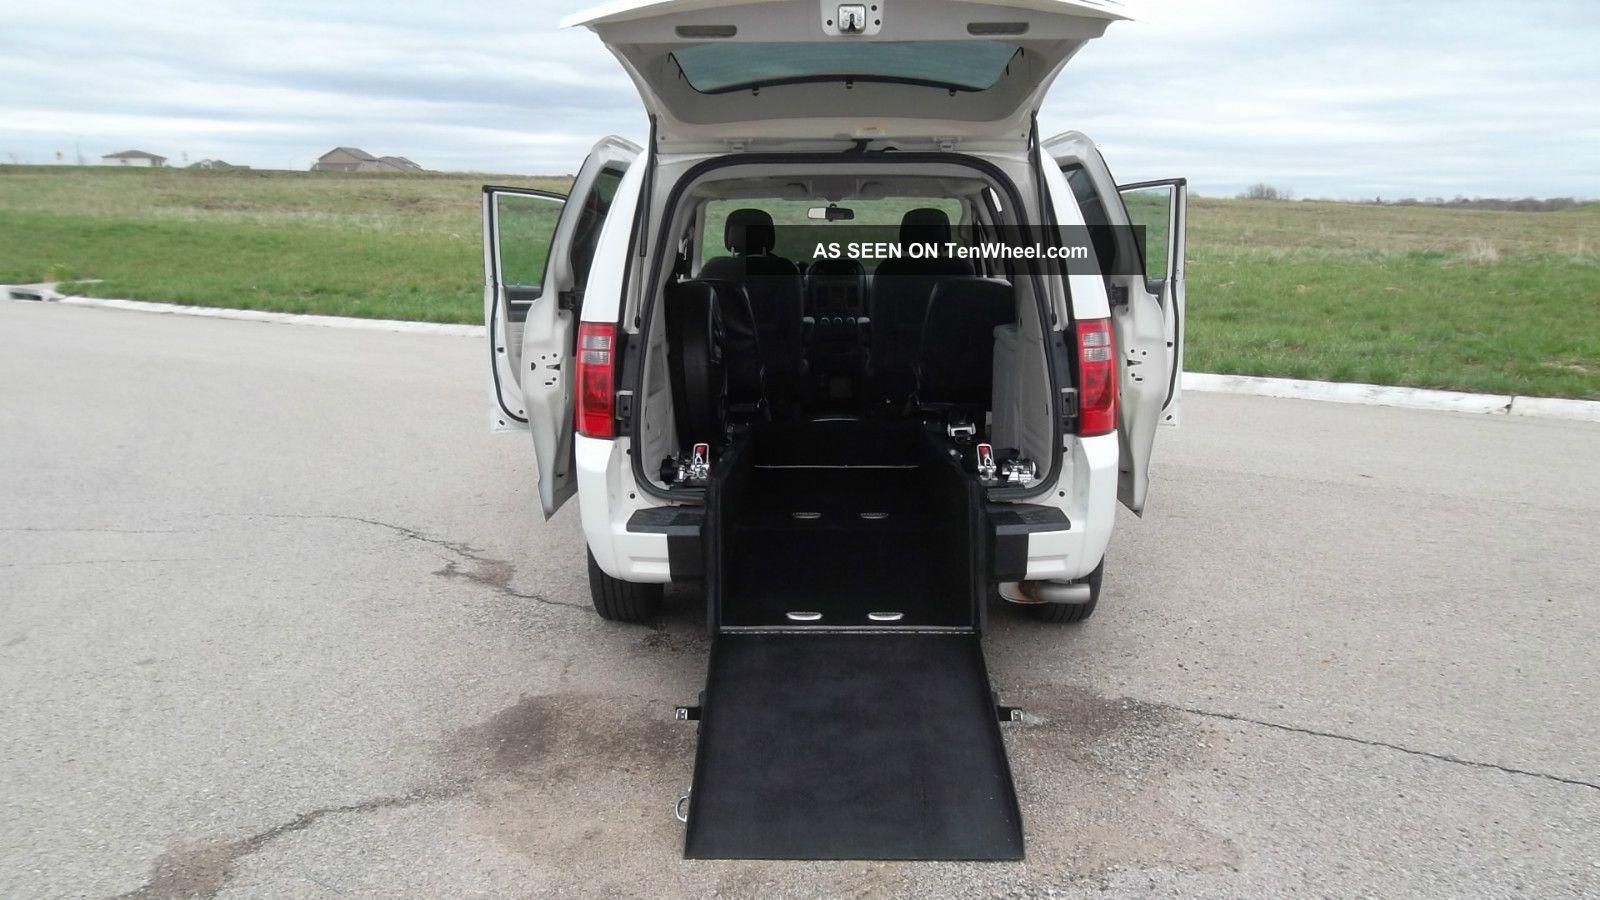 2010 Dodge Grand Caravan Wheelchair Handicap Rear Entry